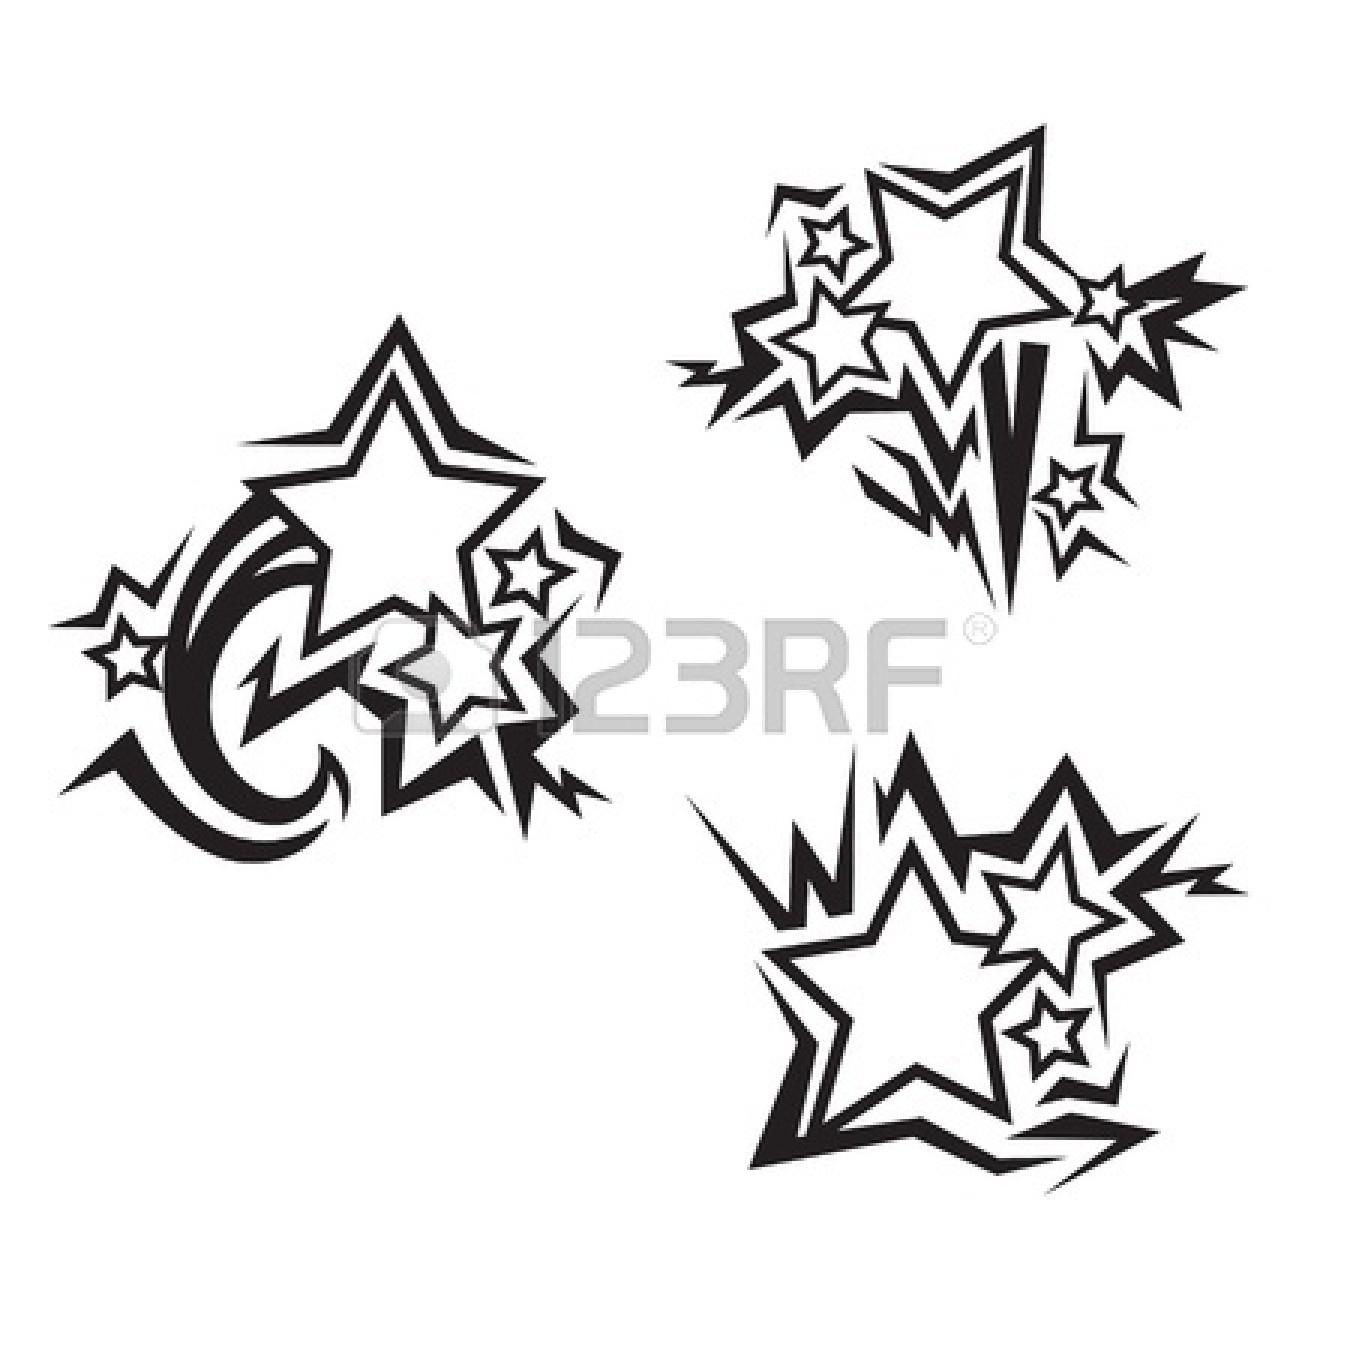 1350x1350 Graffiti Star Drawing How To Draw A Shooting Star Step 6 Stars